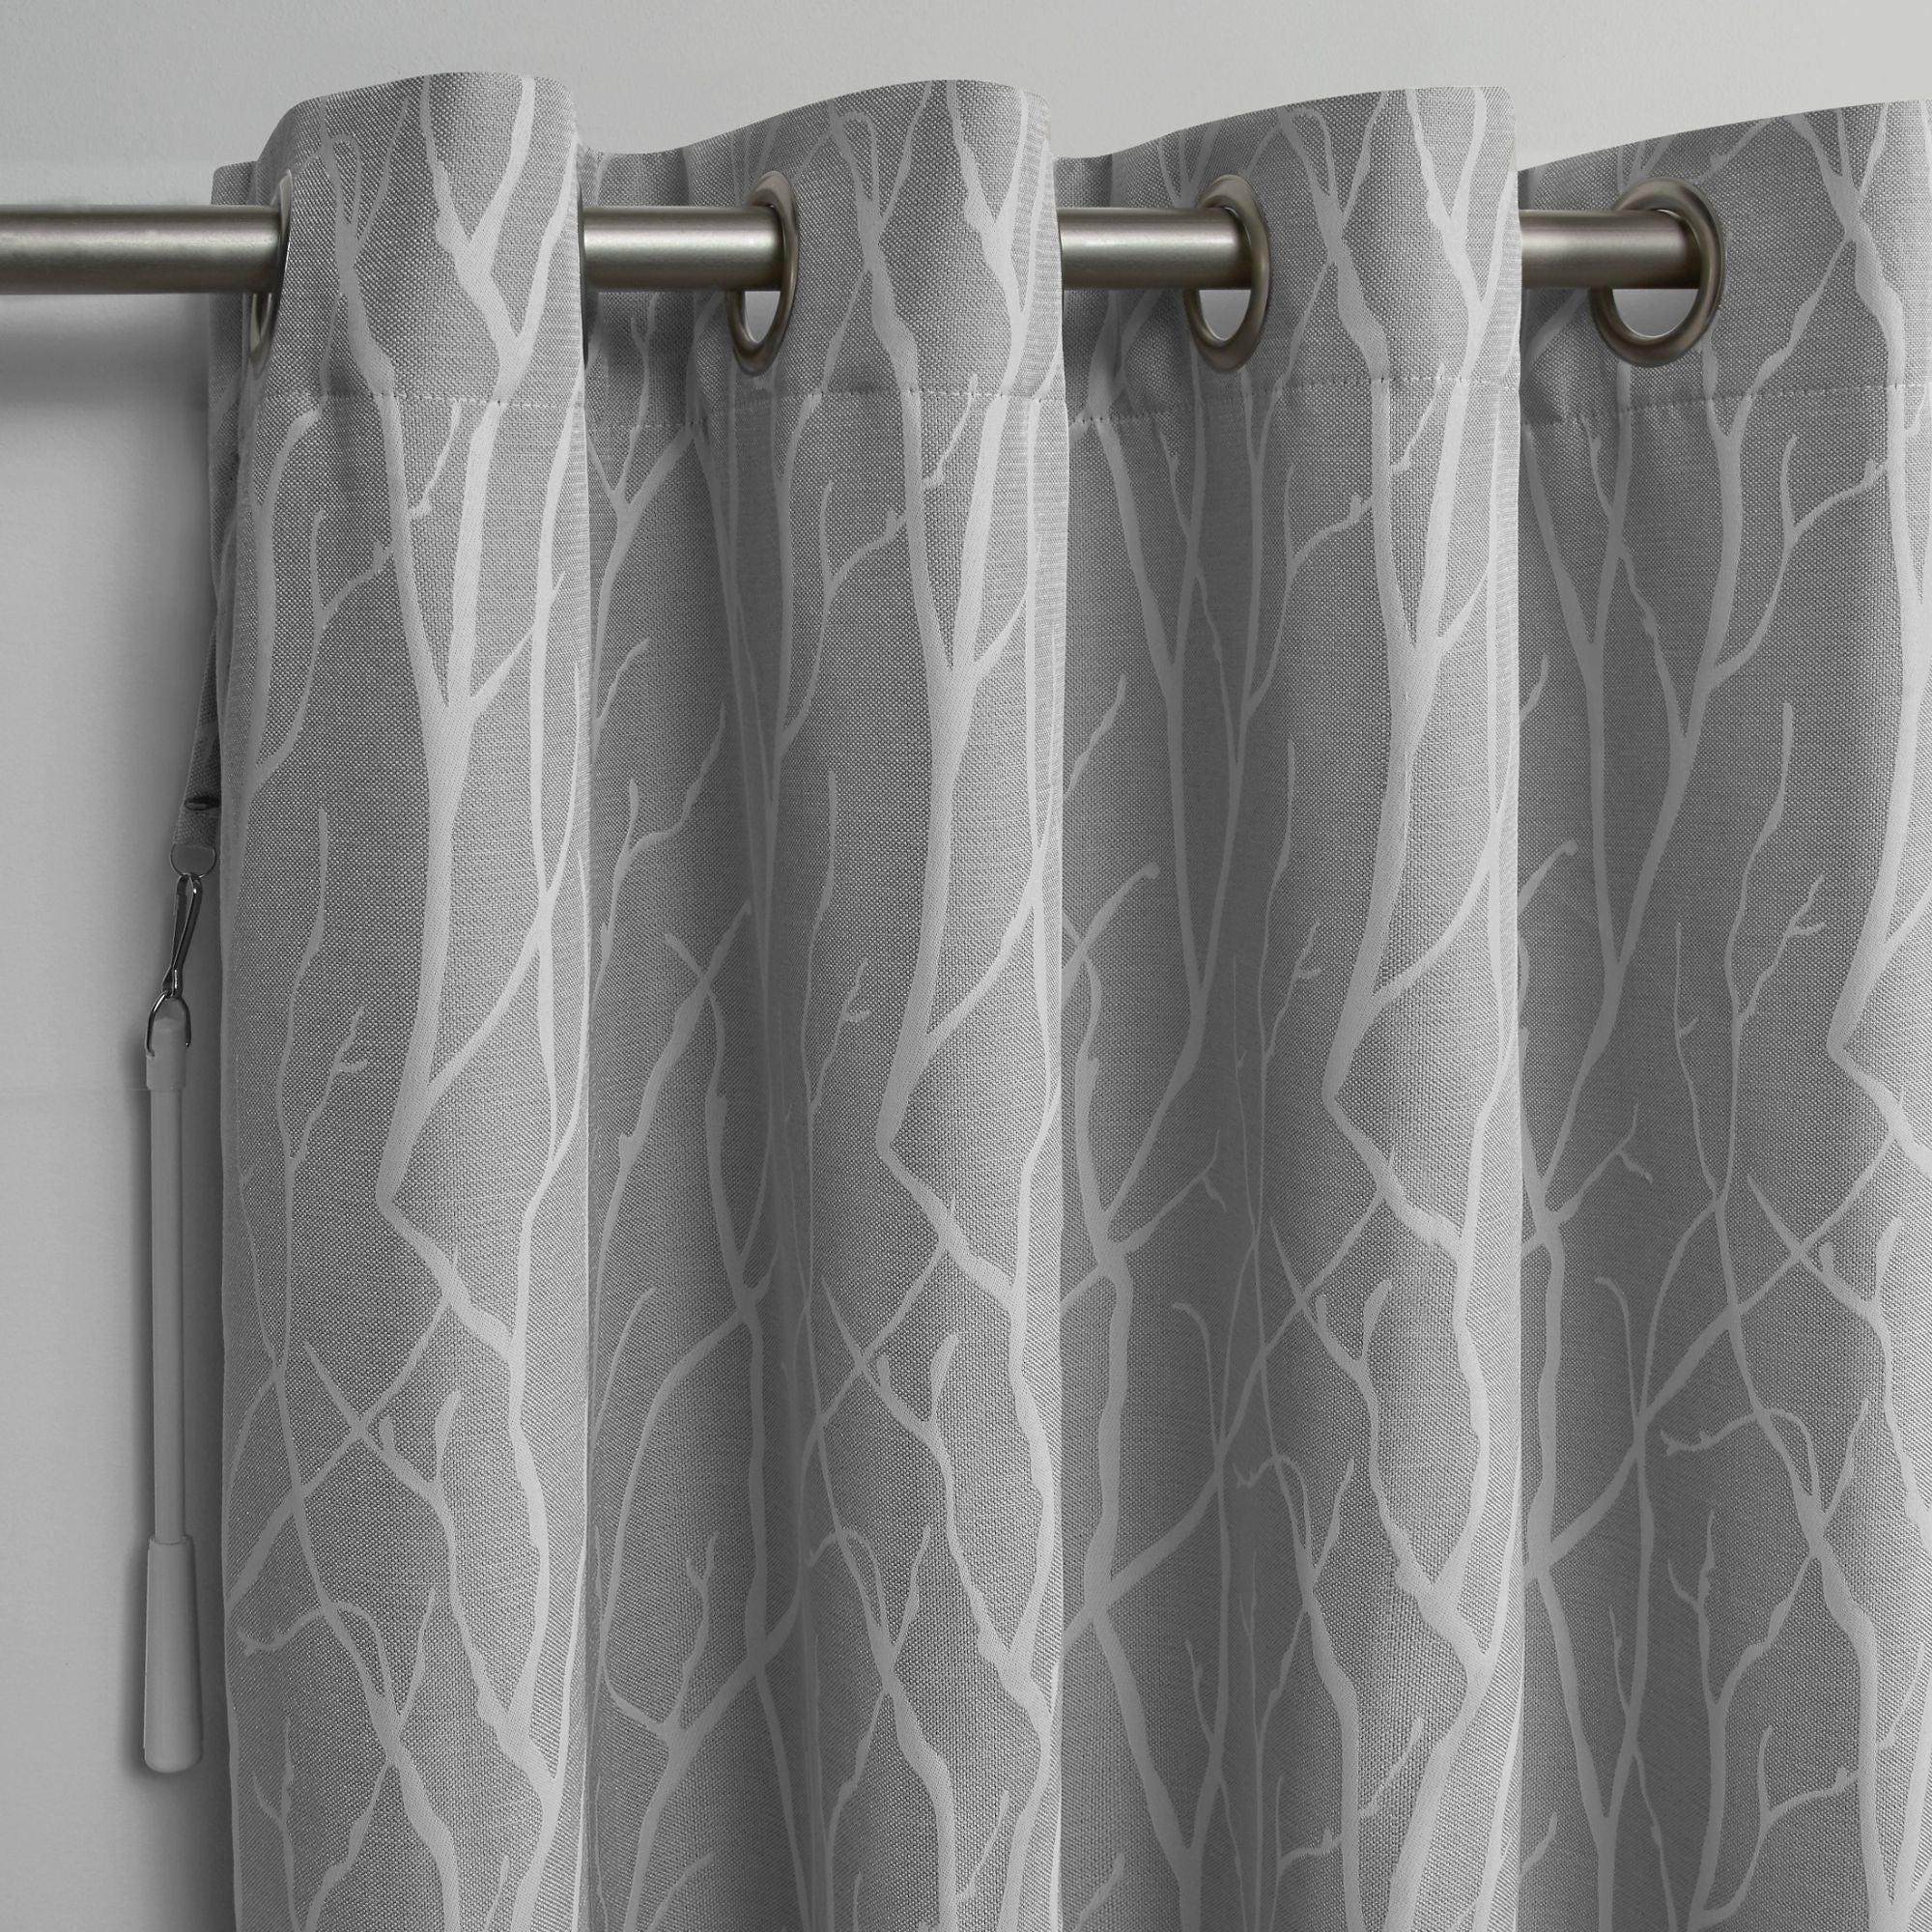 Popular Porch & Den Davis Patio Grommet Top 84 Inch X 108 Inch Single Curtain Panel Regarding Davis Patio Grommet Top Single Curtain Panels (View 14 of 20)